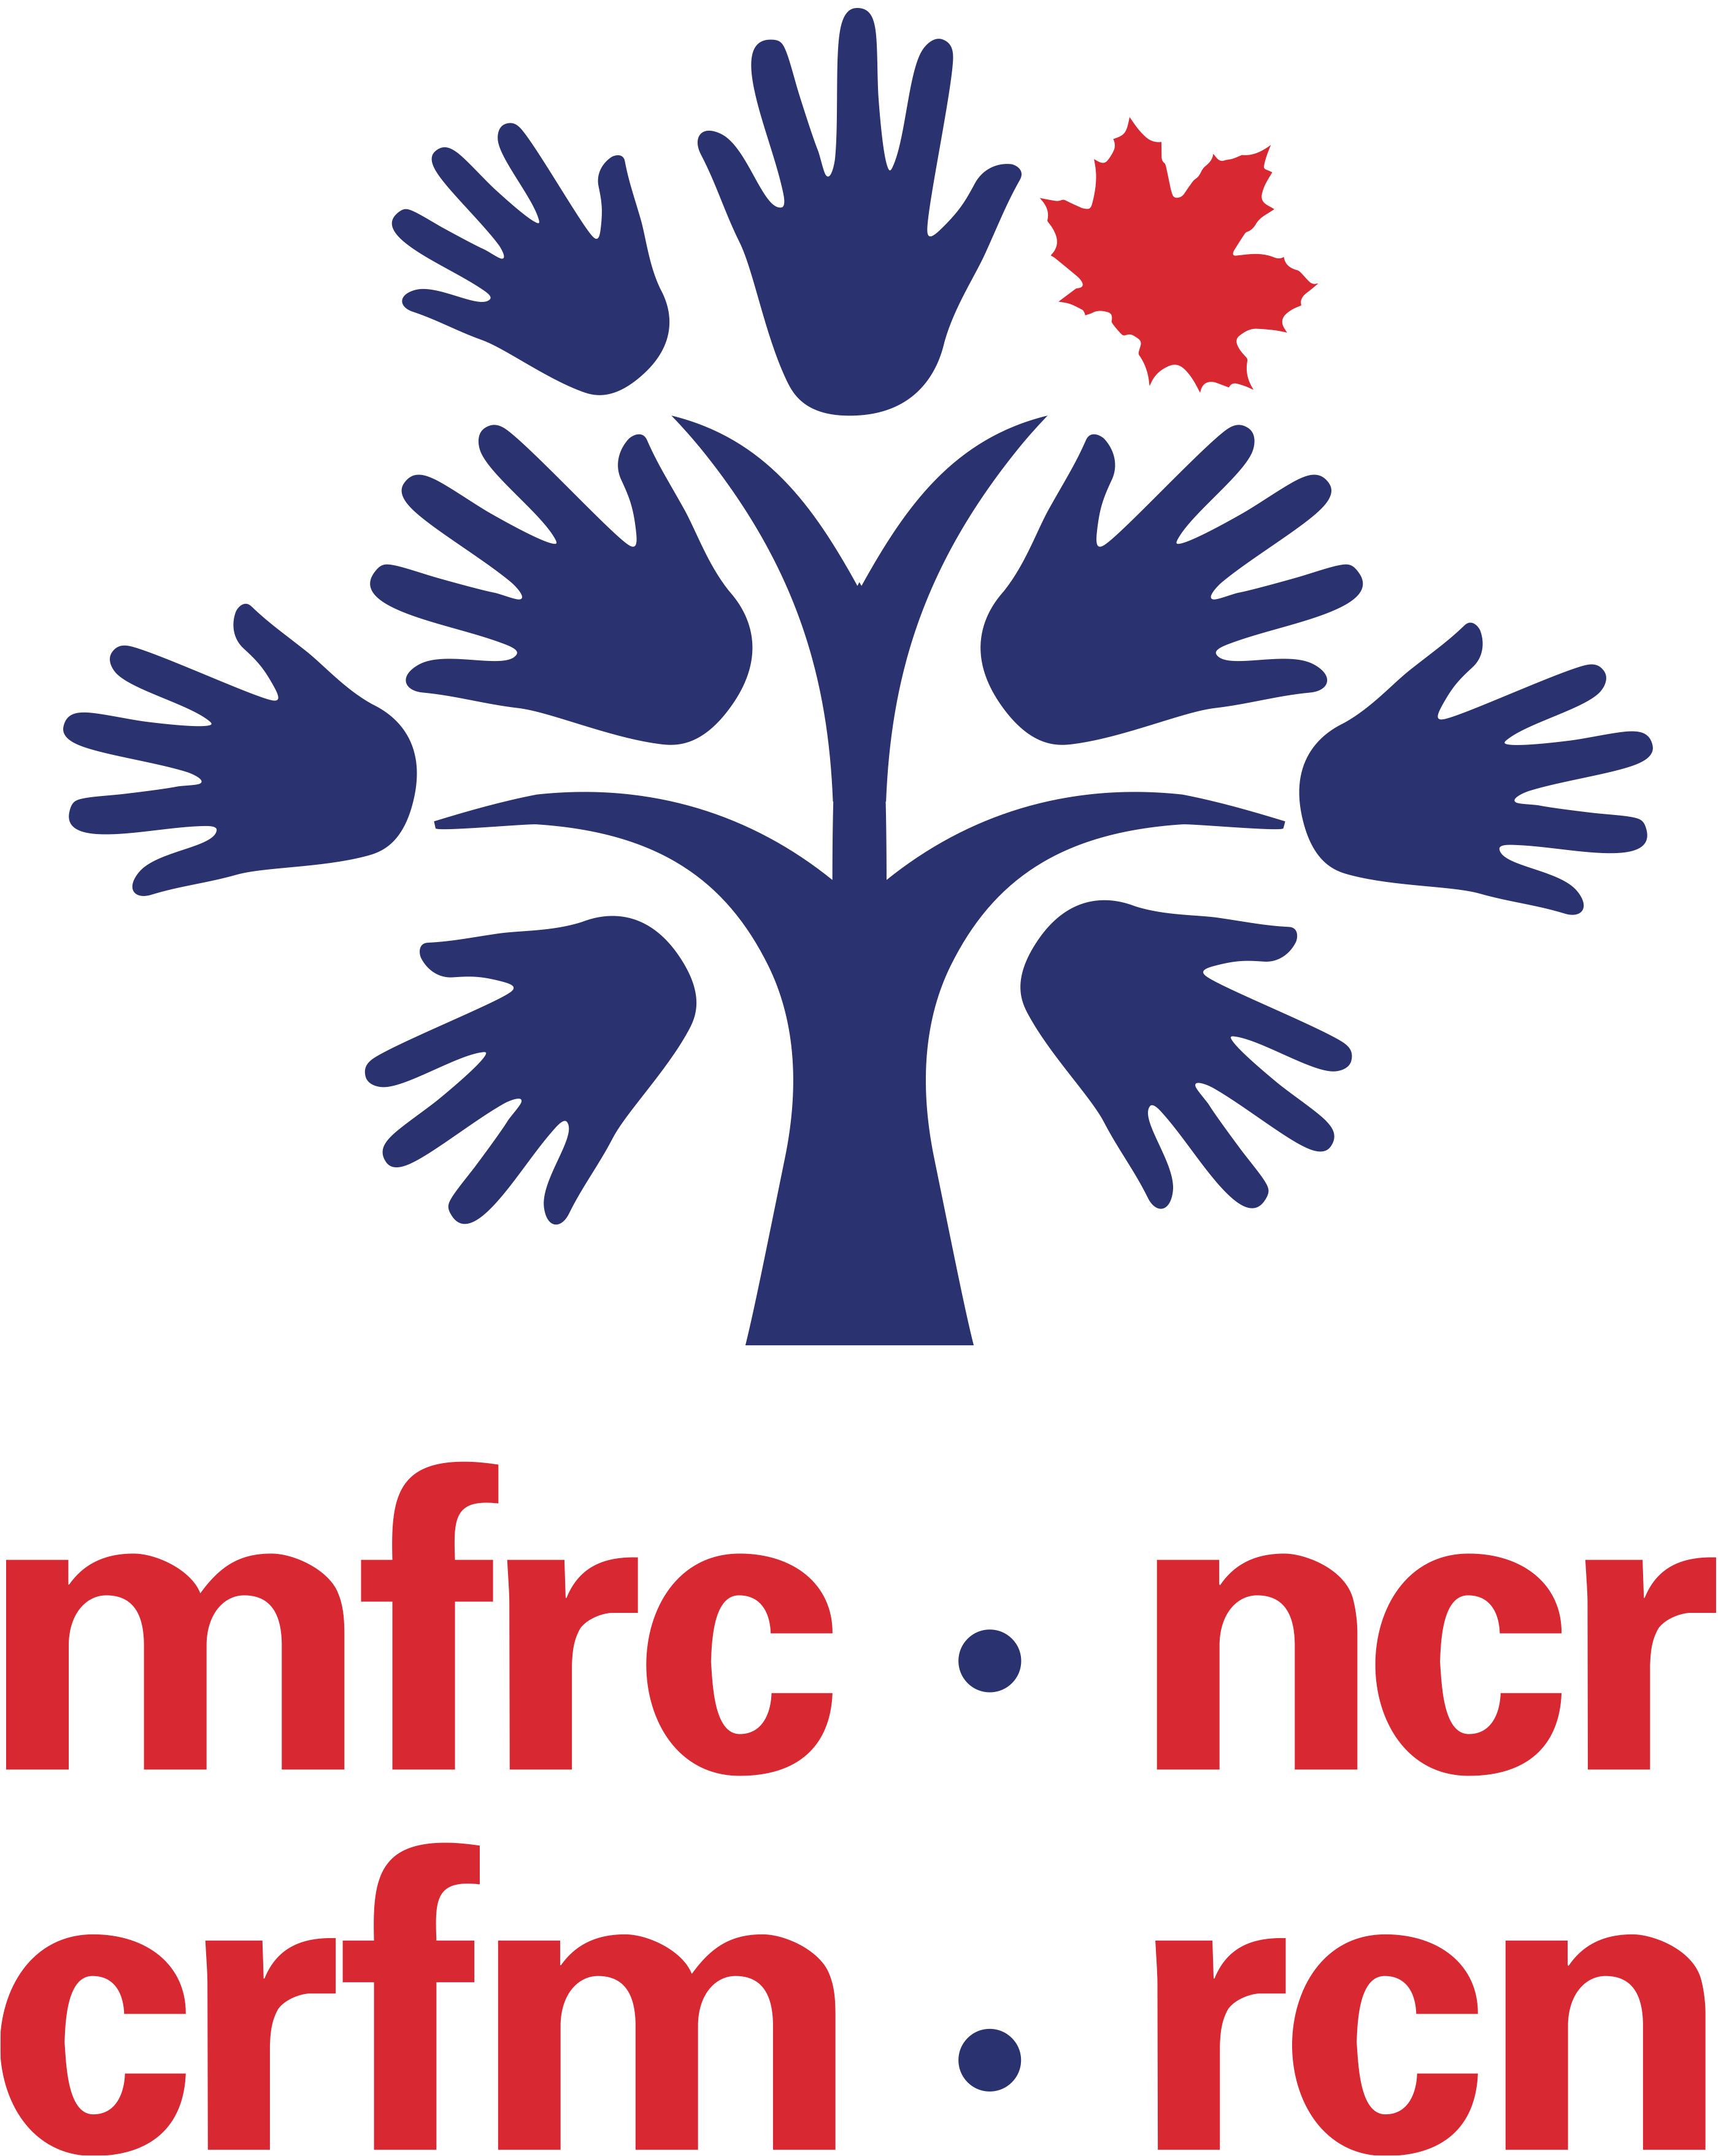 MFRC-NCR